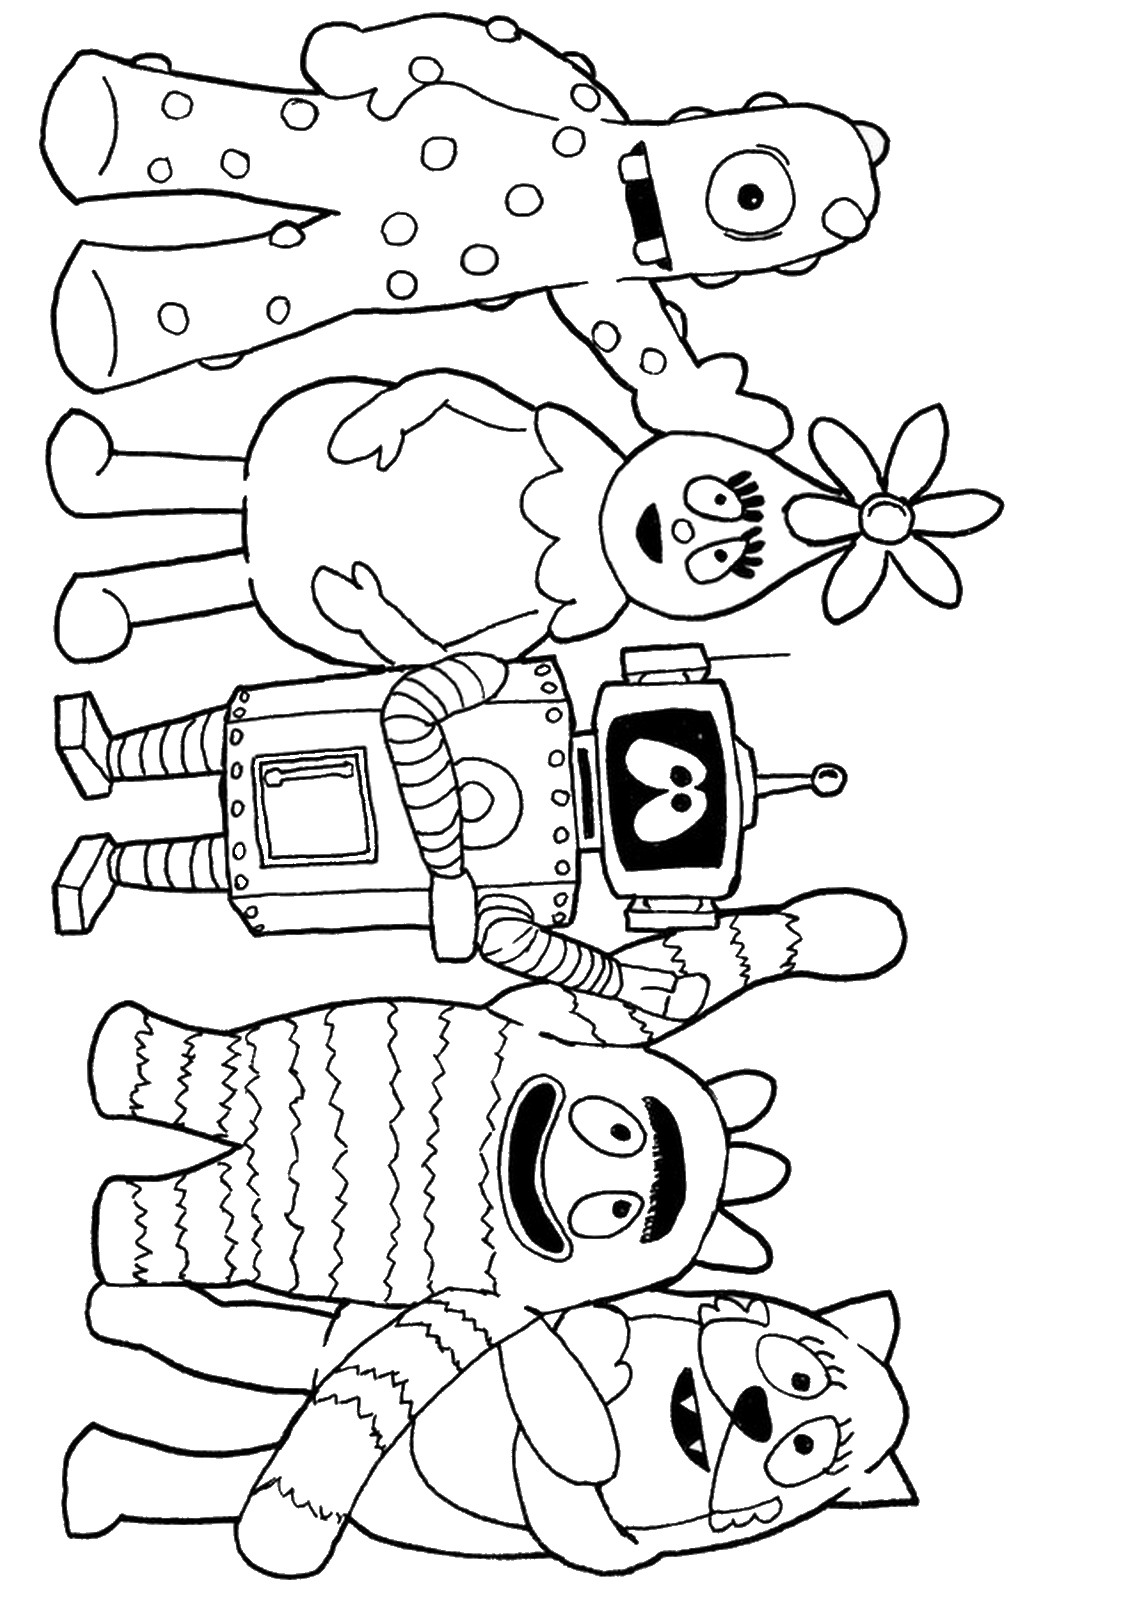 Yo gabba gabba coloring pages birthday printable for Yo gabba gabba coloring pages